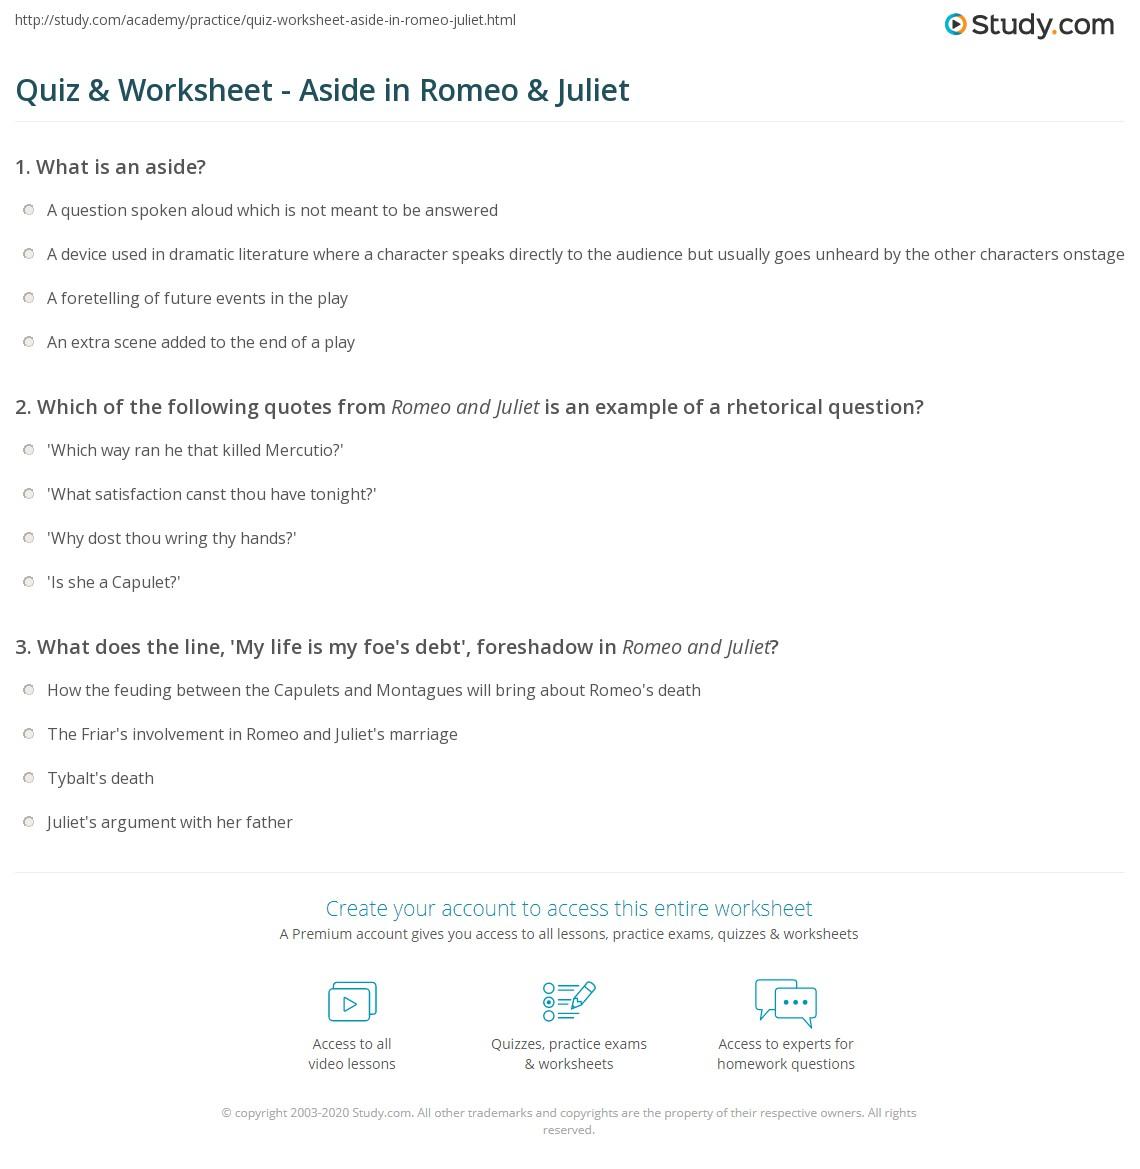 Quiz & Worksheet - Aside in Romeo & Juliet | Study.com